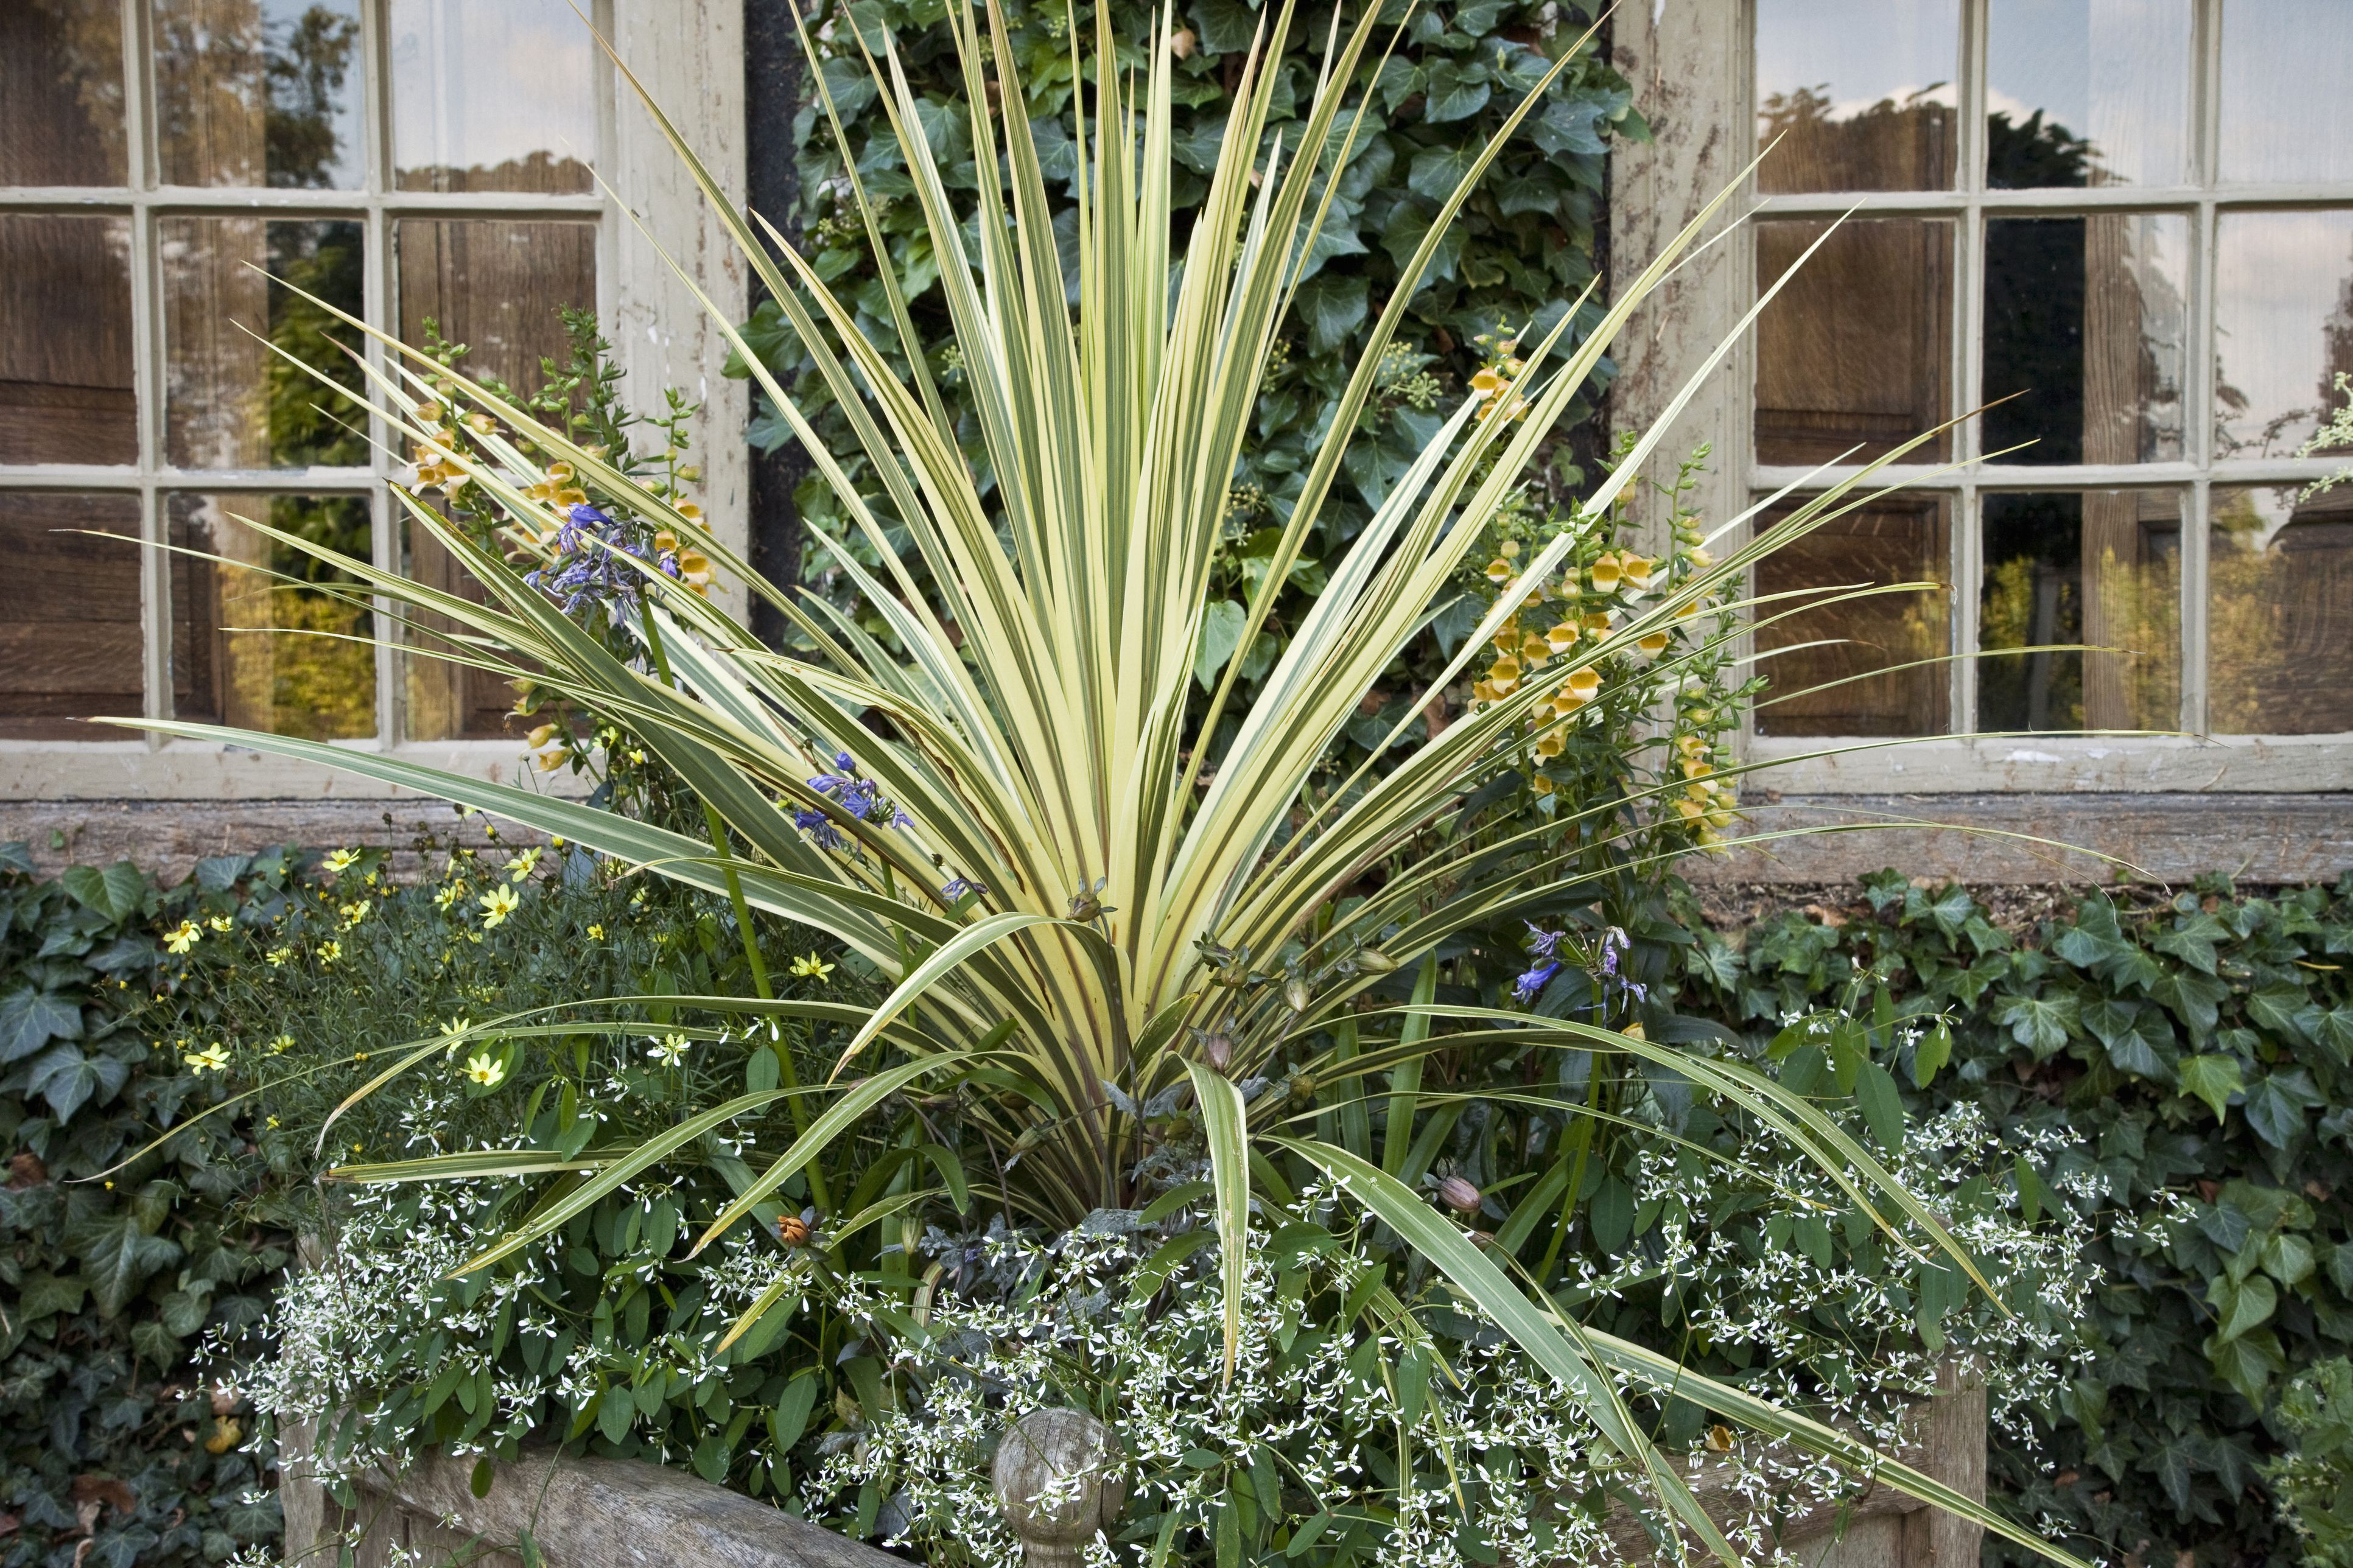 Growing New Zealand Flax Phormium